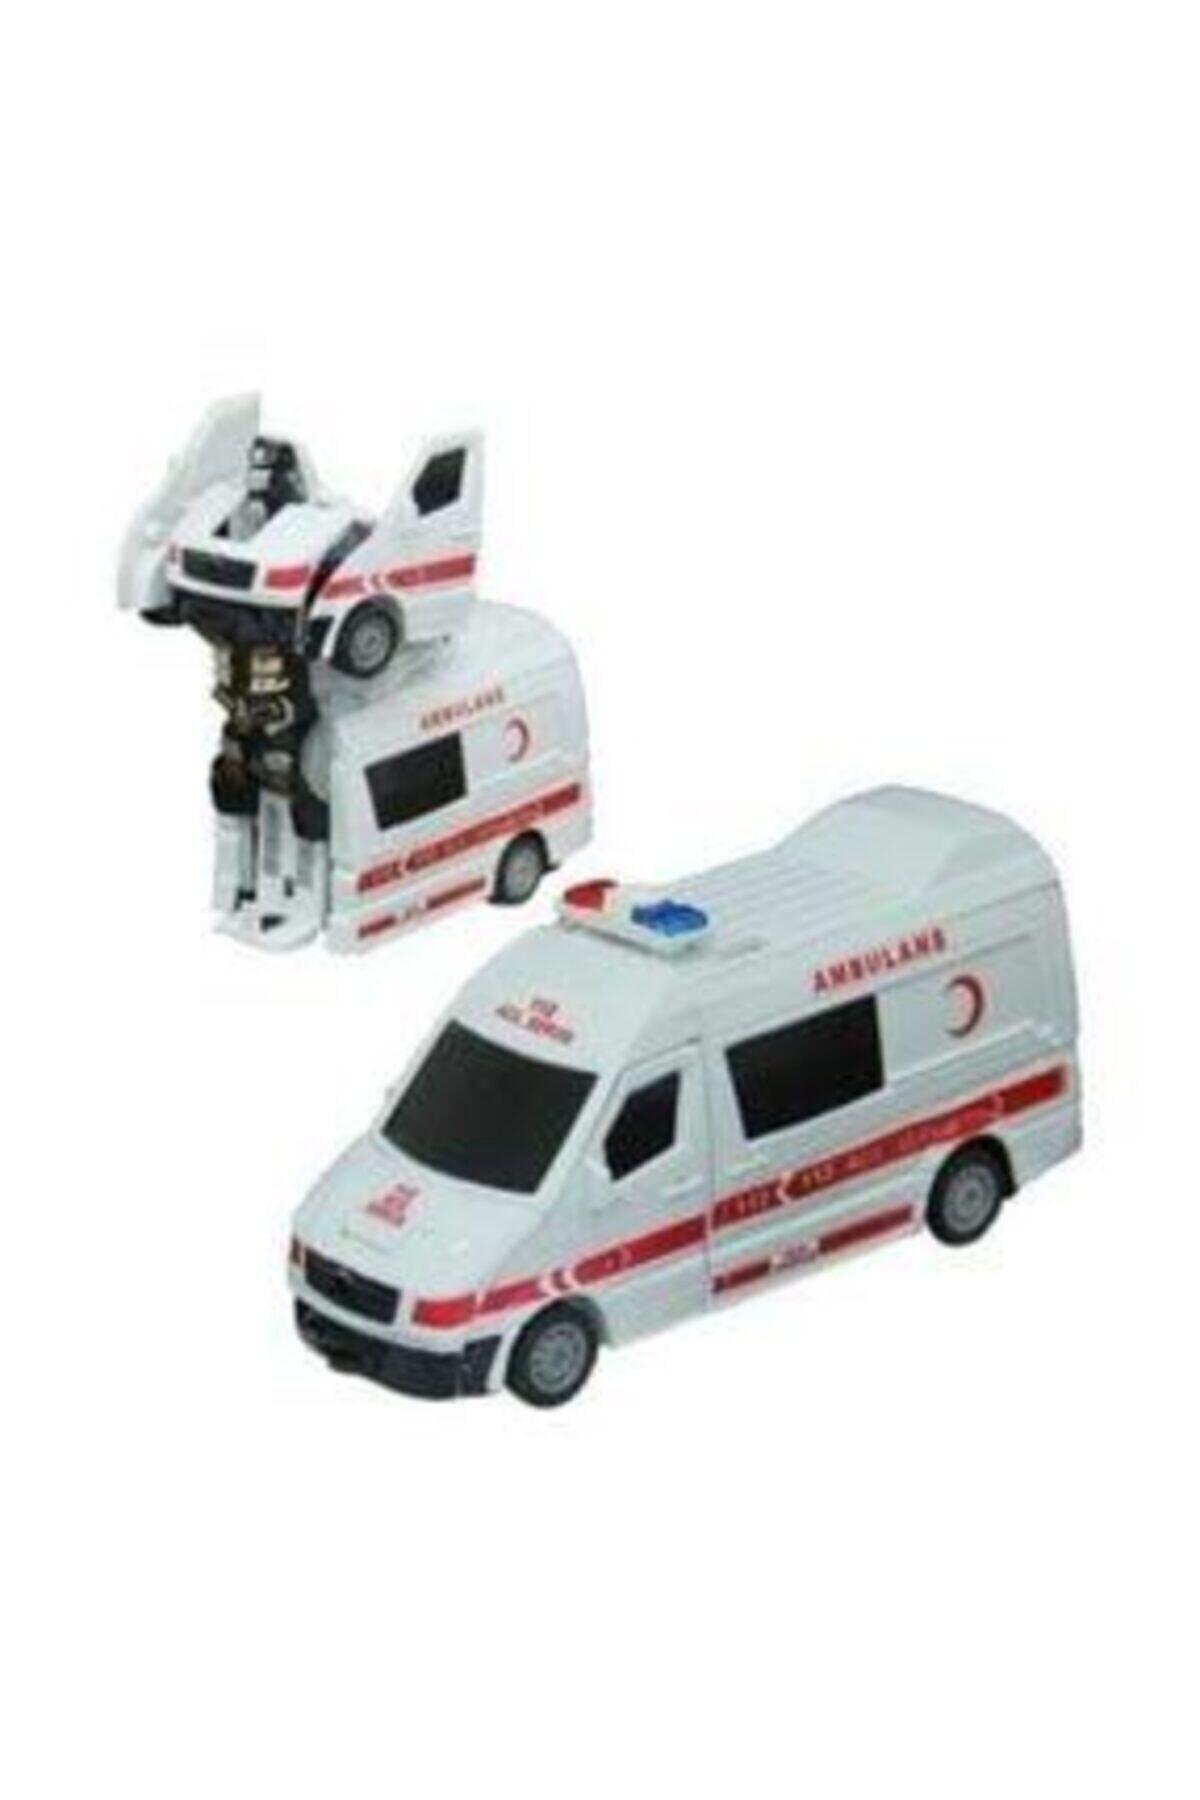 Işıklı Sesli Robota Dönüşen Ambulans Itfaiye Polis